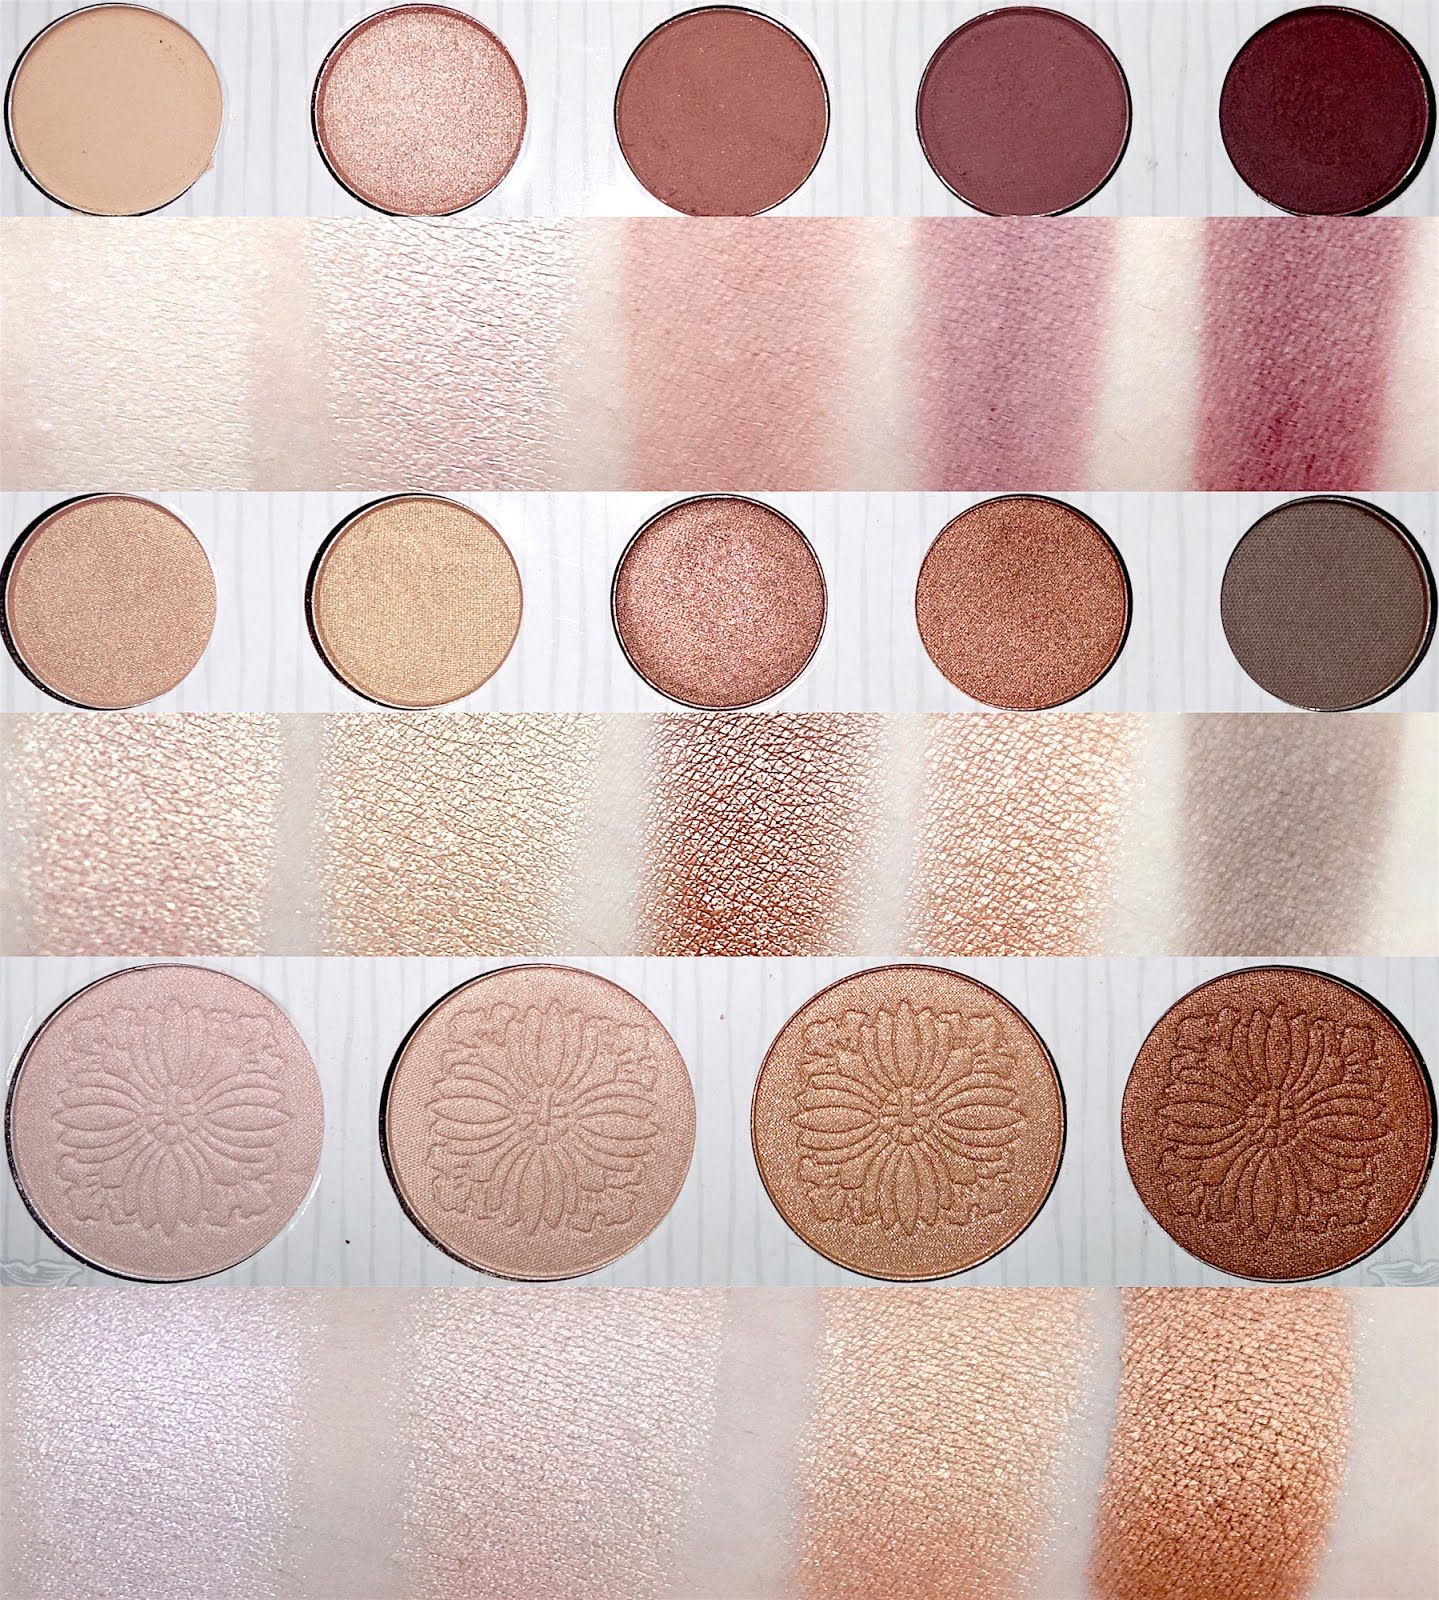 Studio Pro Shade & Define 10 Color Contour Palette by BH Cosmetics #12